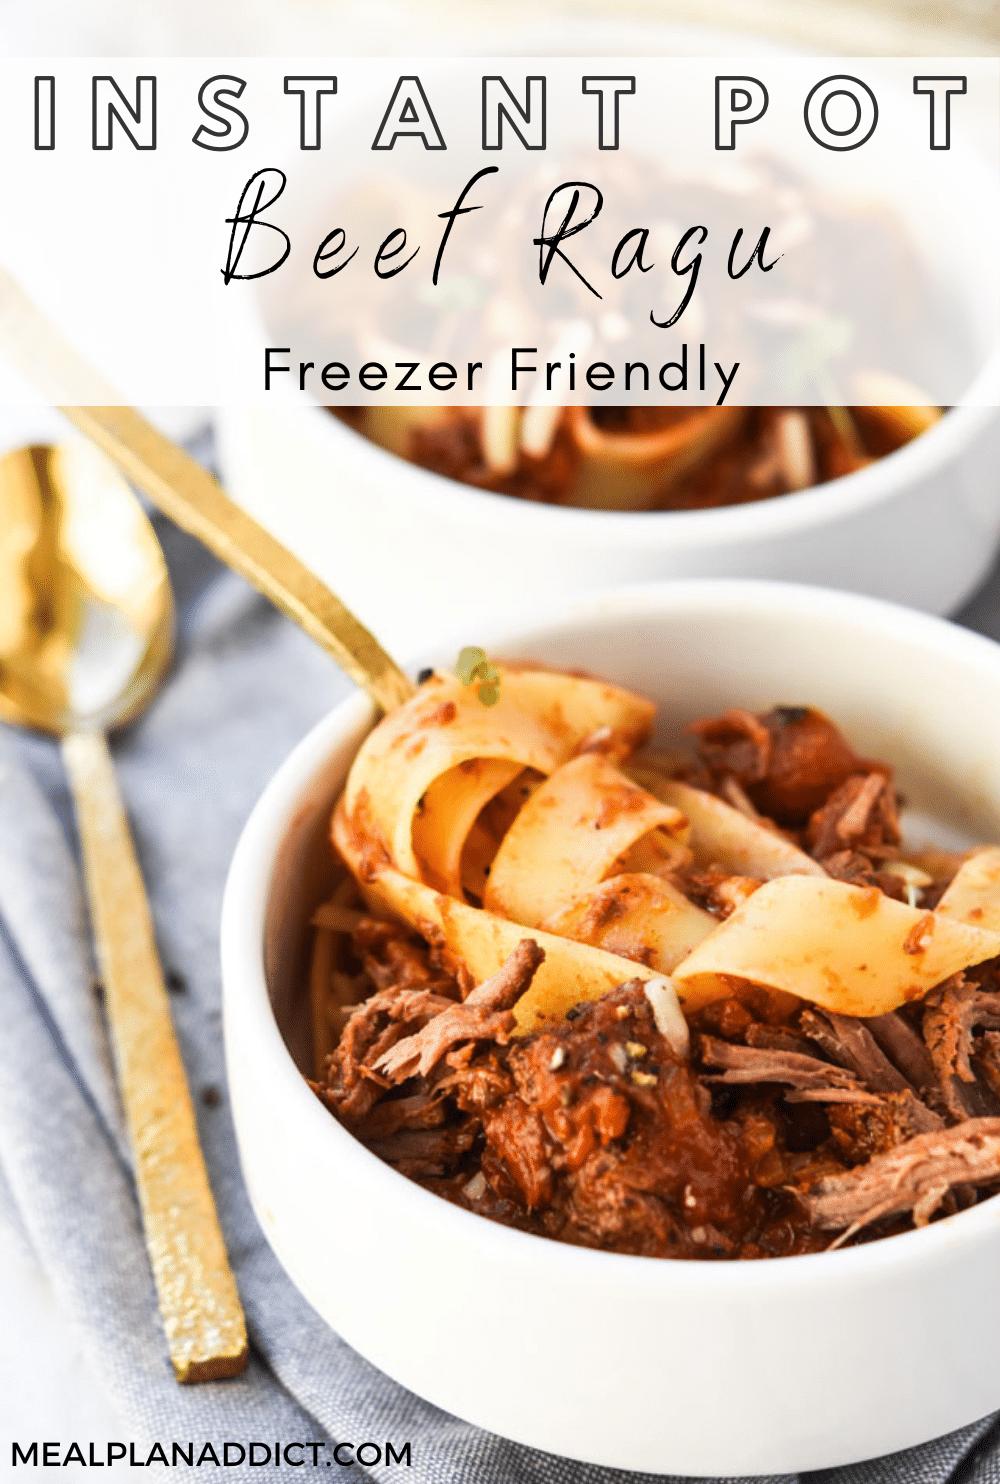 Freezer Friendly Instant Pot Beef Ragu   Meal Plan Addict